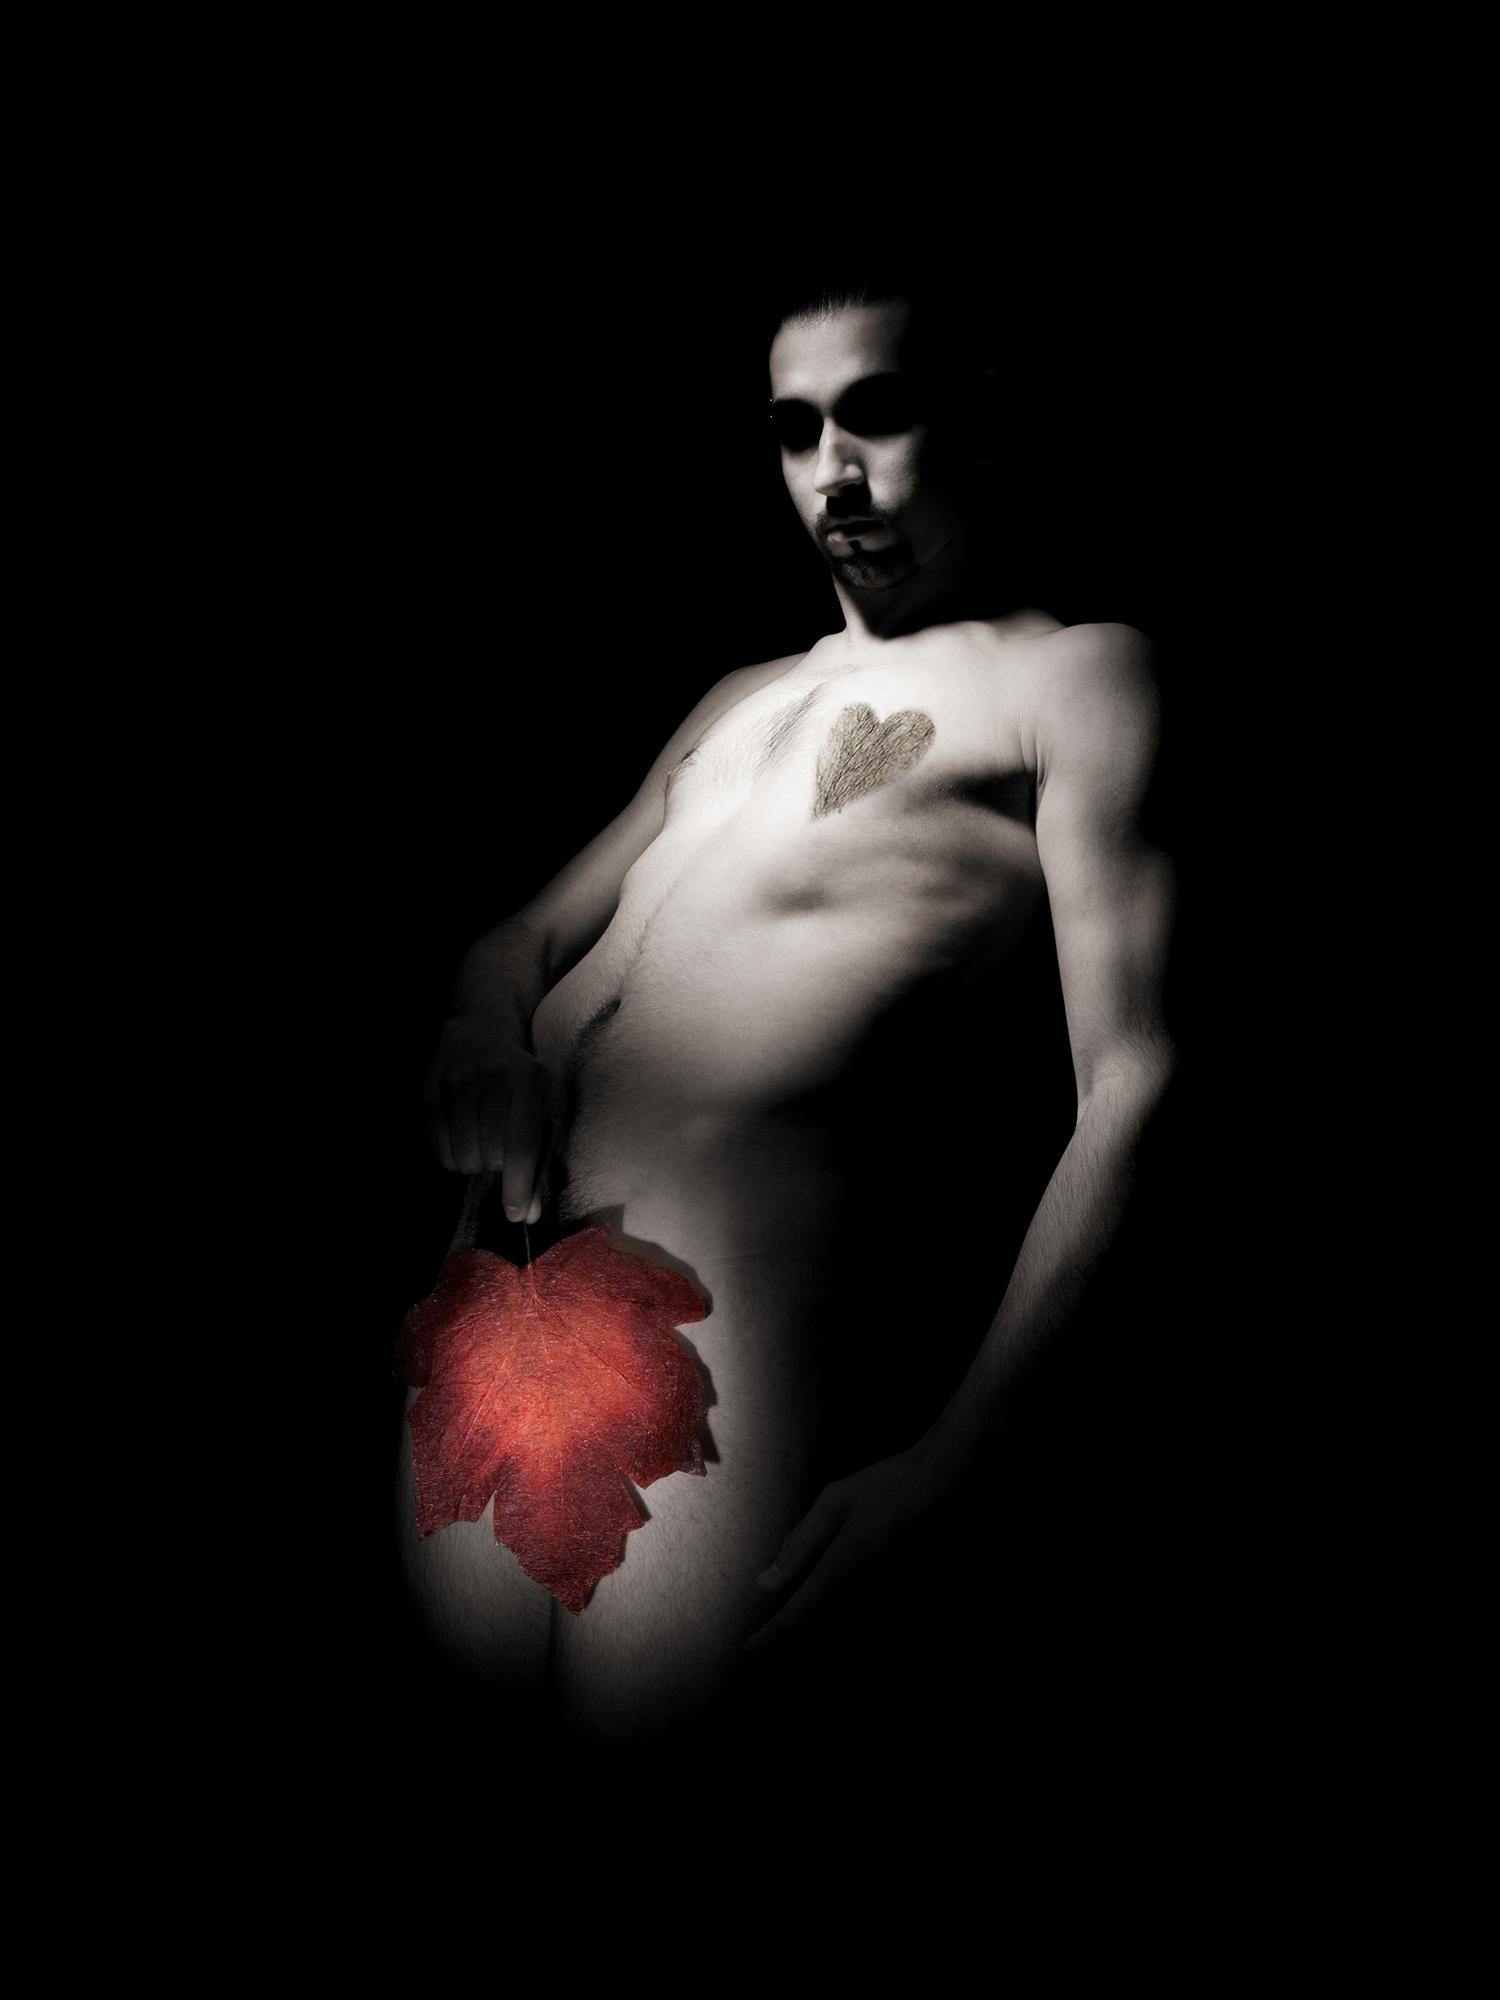 avere i peli sul cuore-30CM X 40CM / 50CM X 70CM / 70CM X 100CM – Print on FineArt Baryta Hahnemühle / dibond-©2009 – Edition of 5